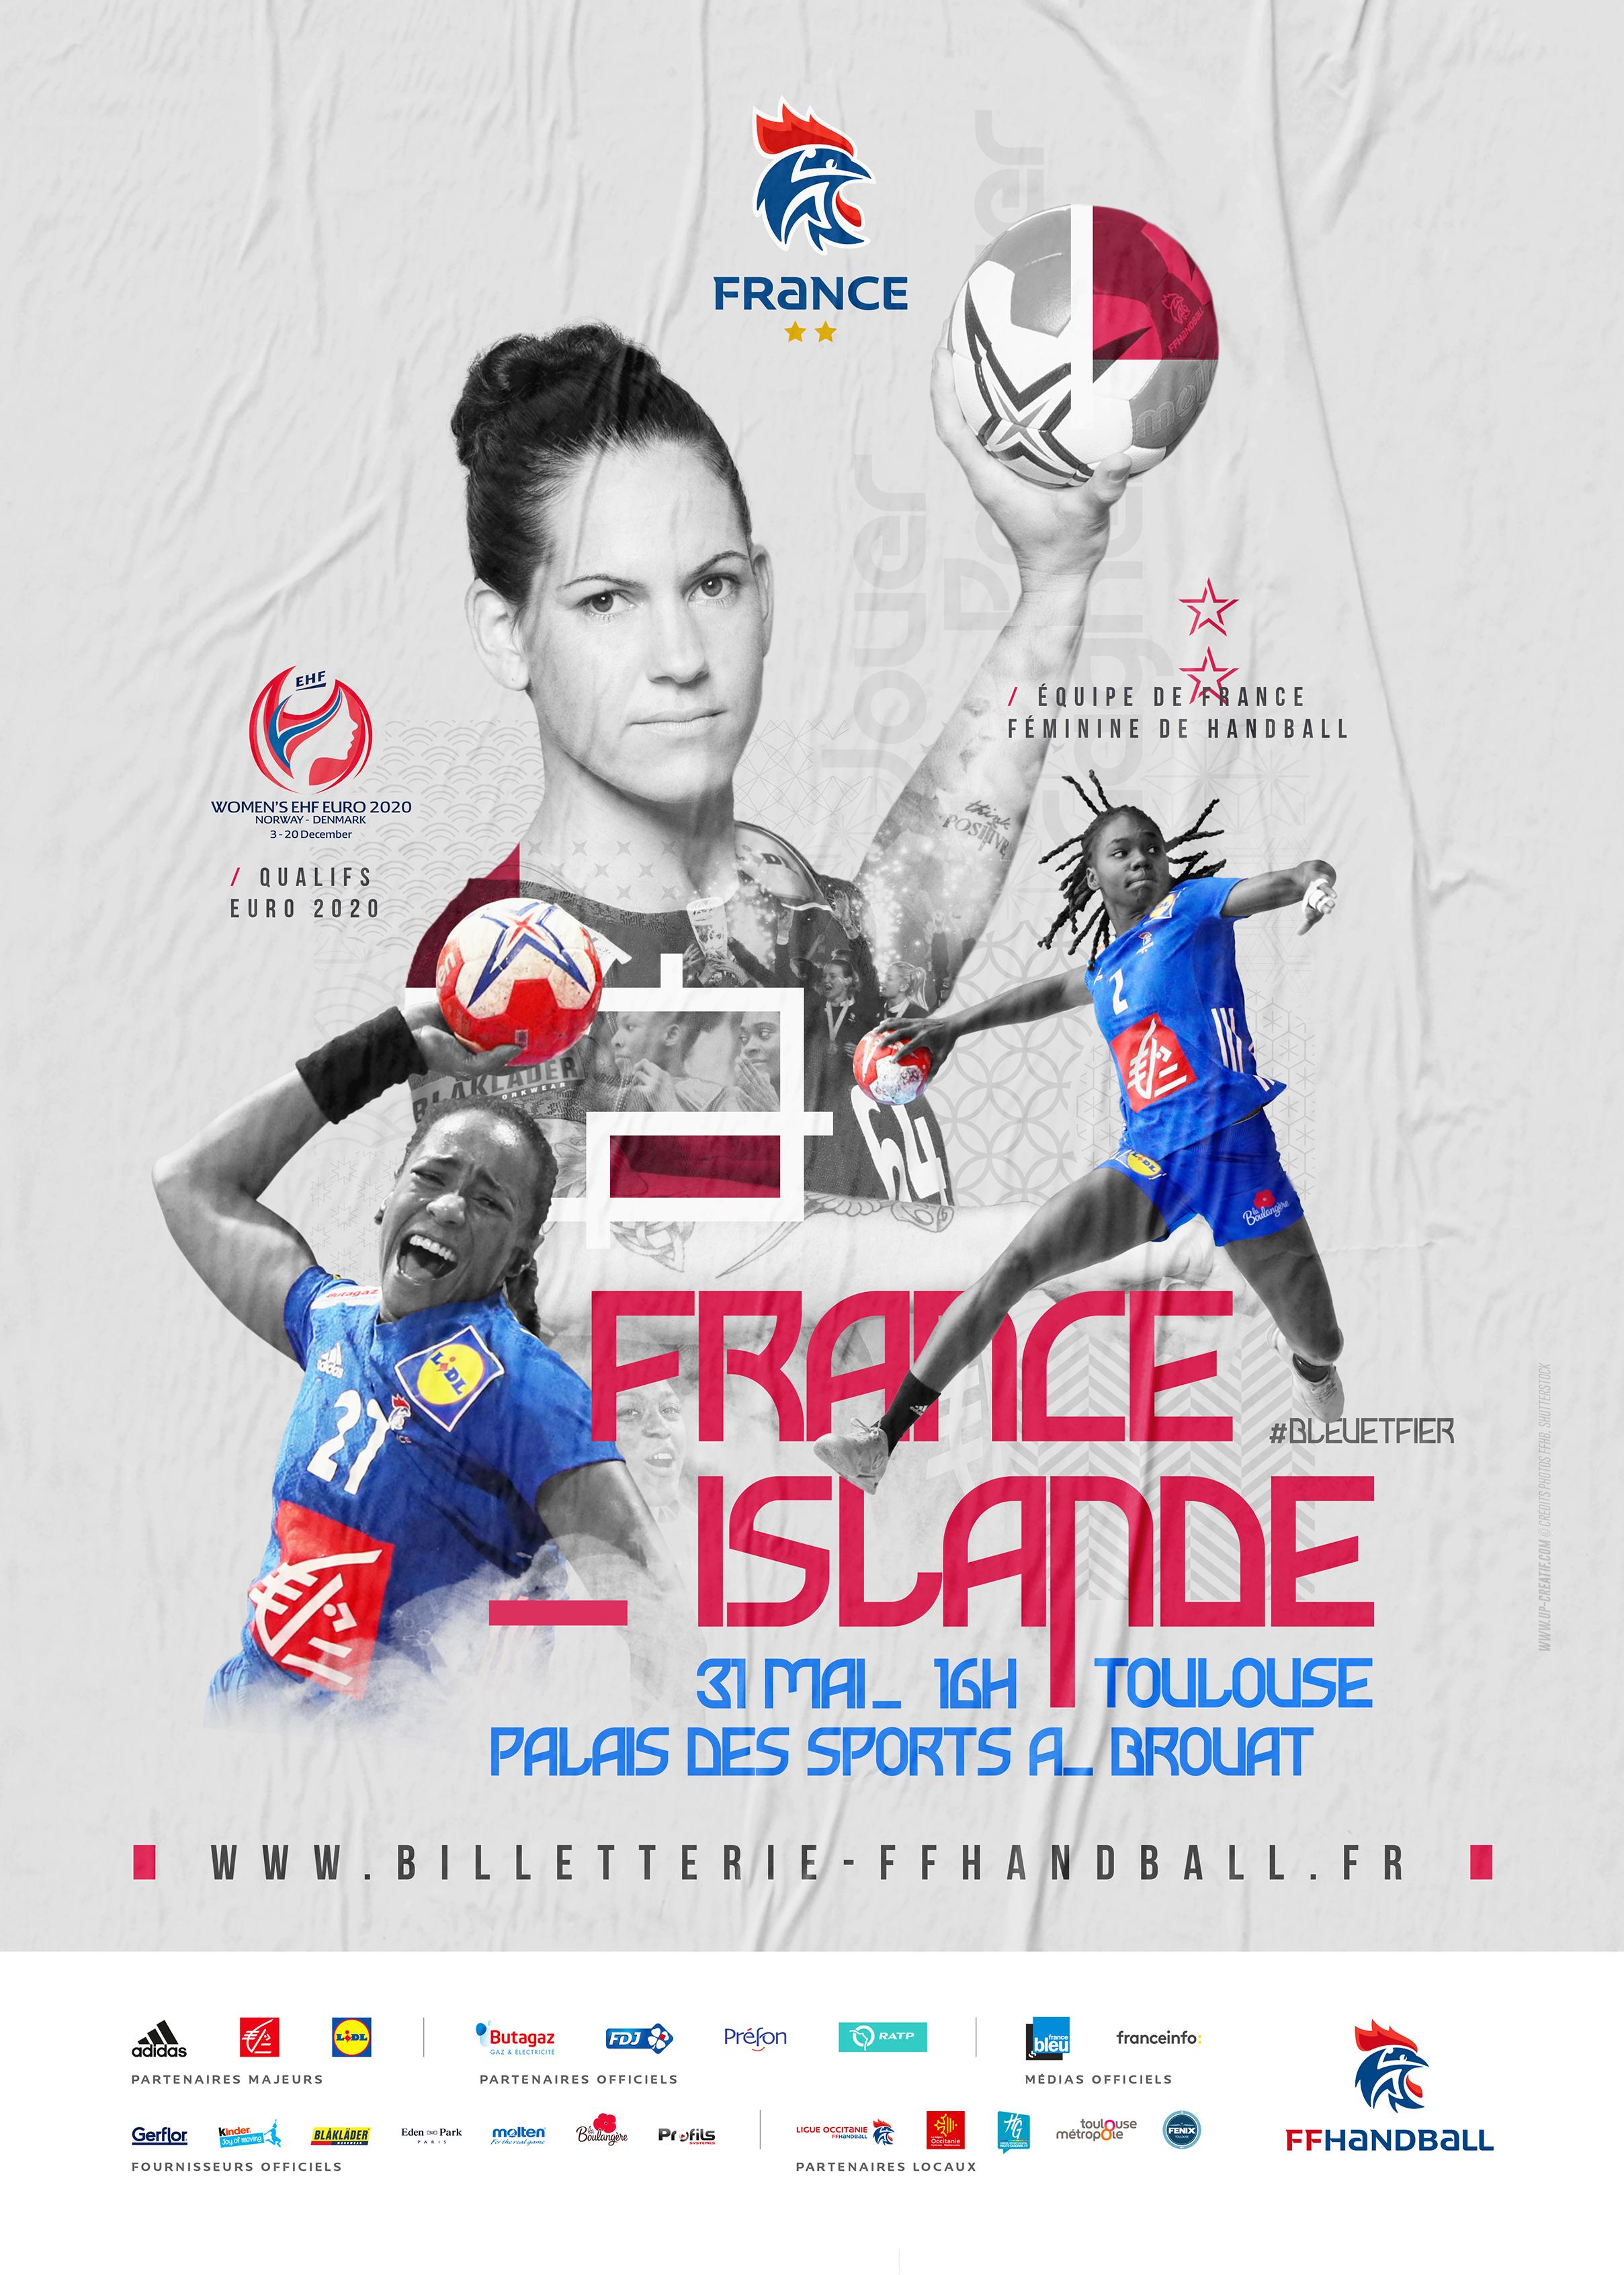 FFHB_QualifsEuro2020_FRAISL